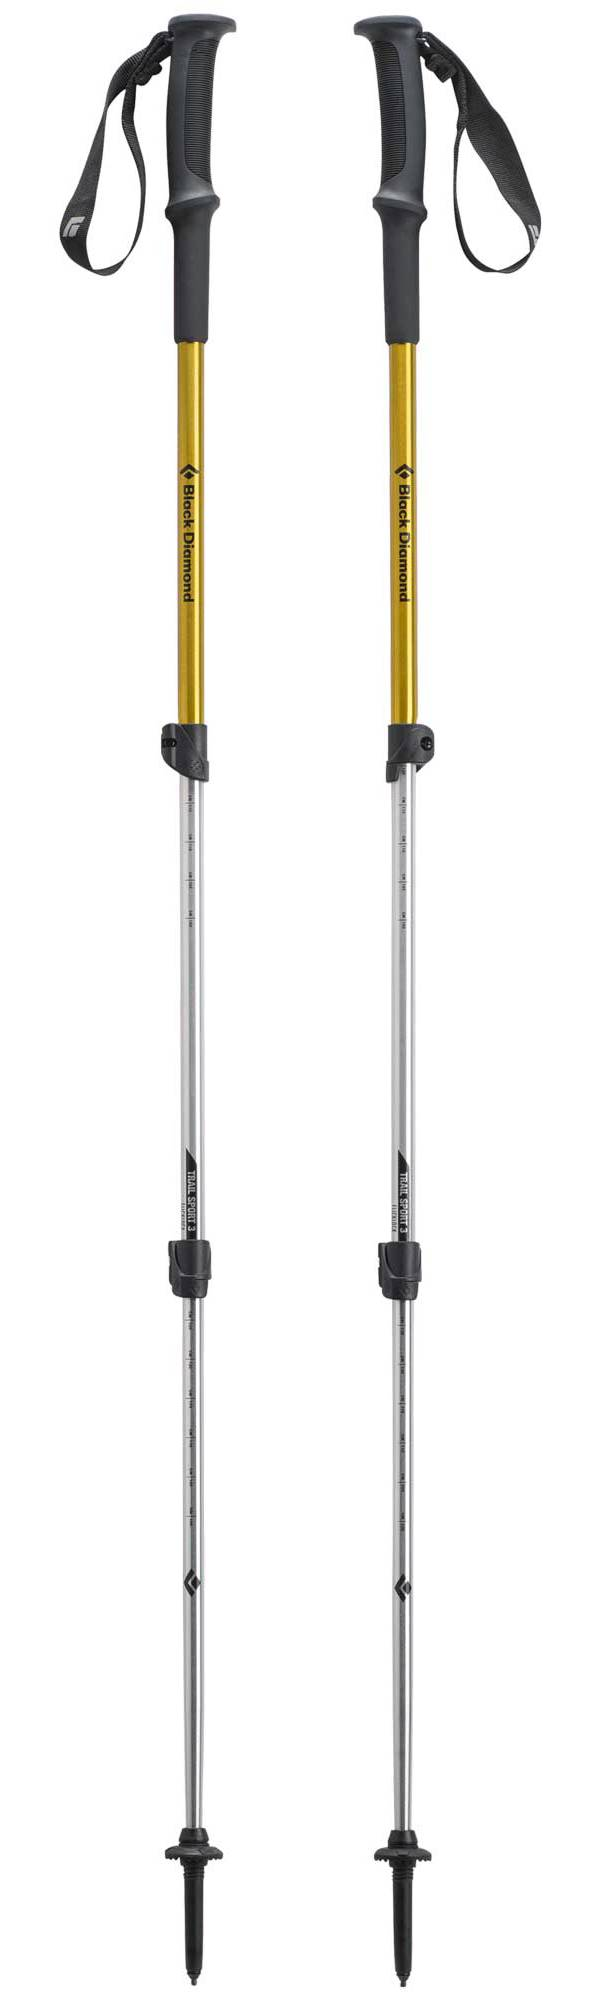 Black Diamond Trail Sport 3 Trekking Pole product image